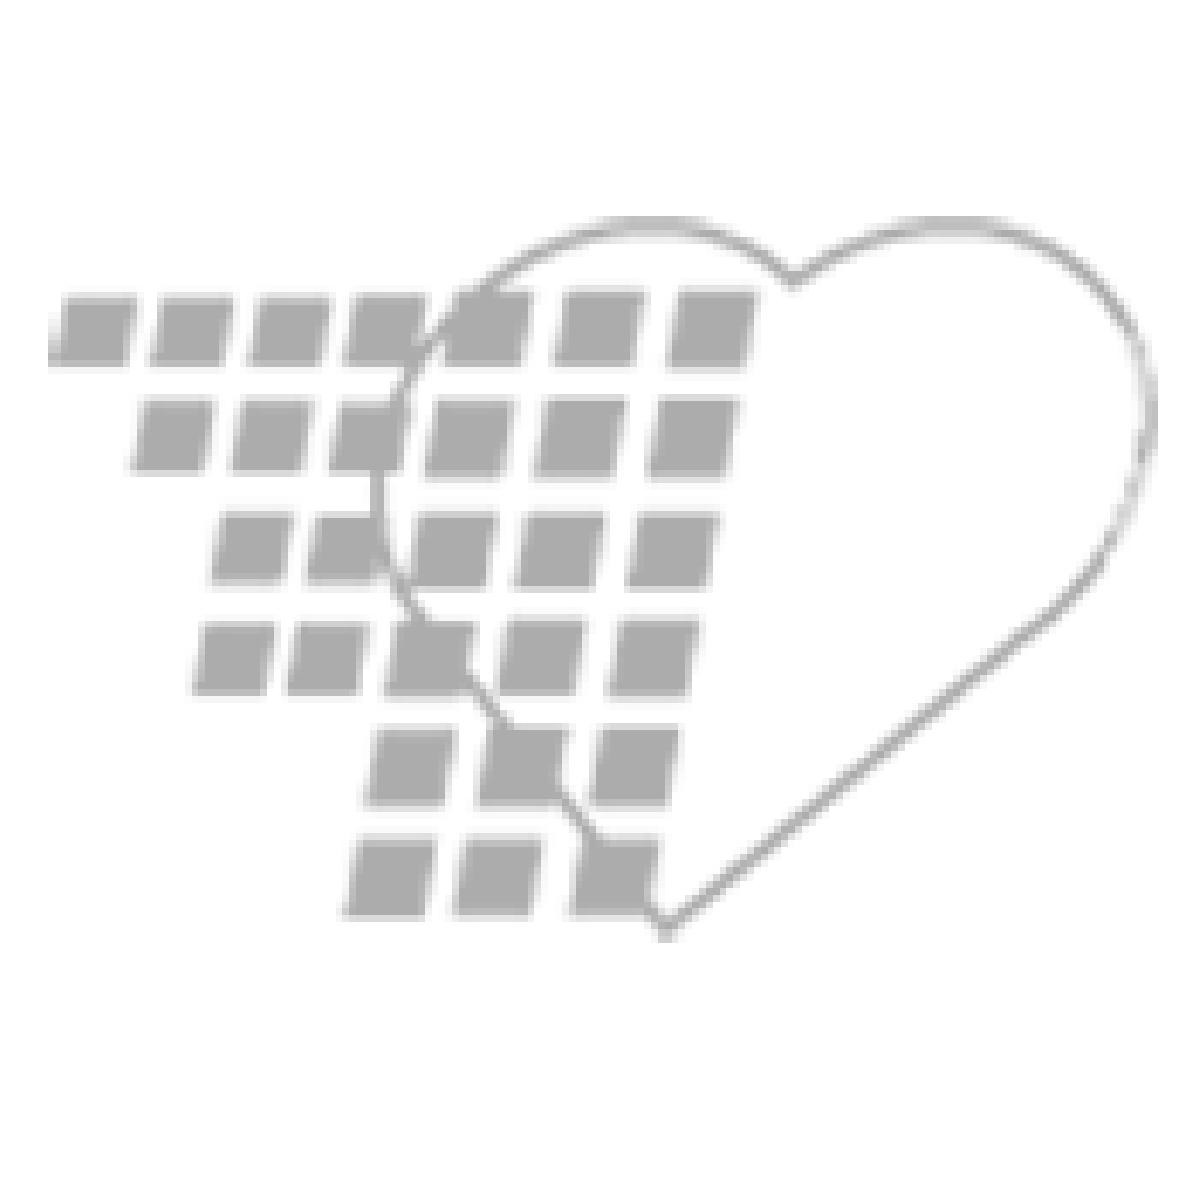 06-93-0429 - Demo Dose® Dextros 10%  250mL